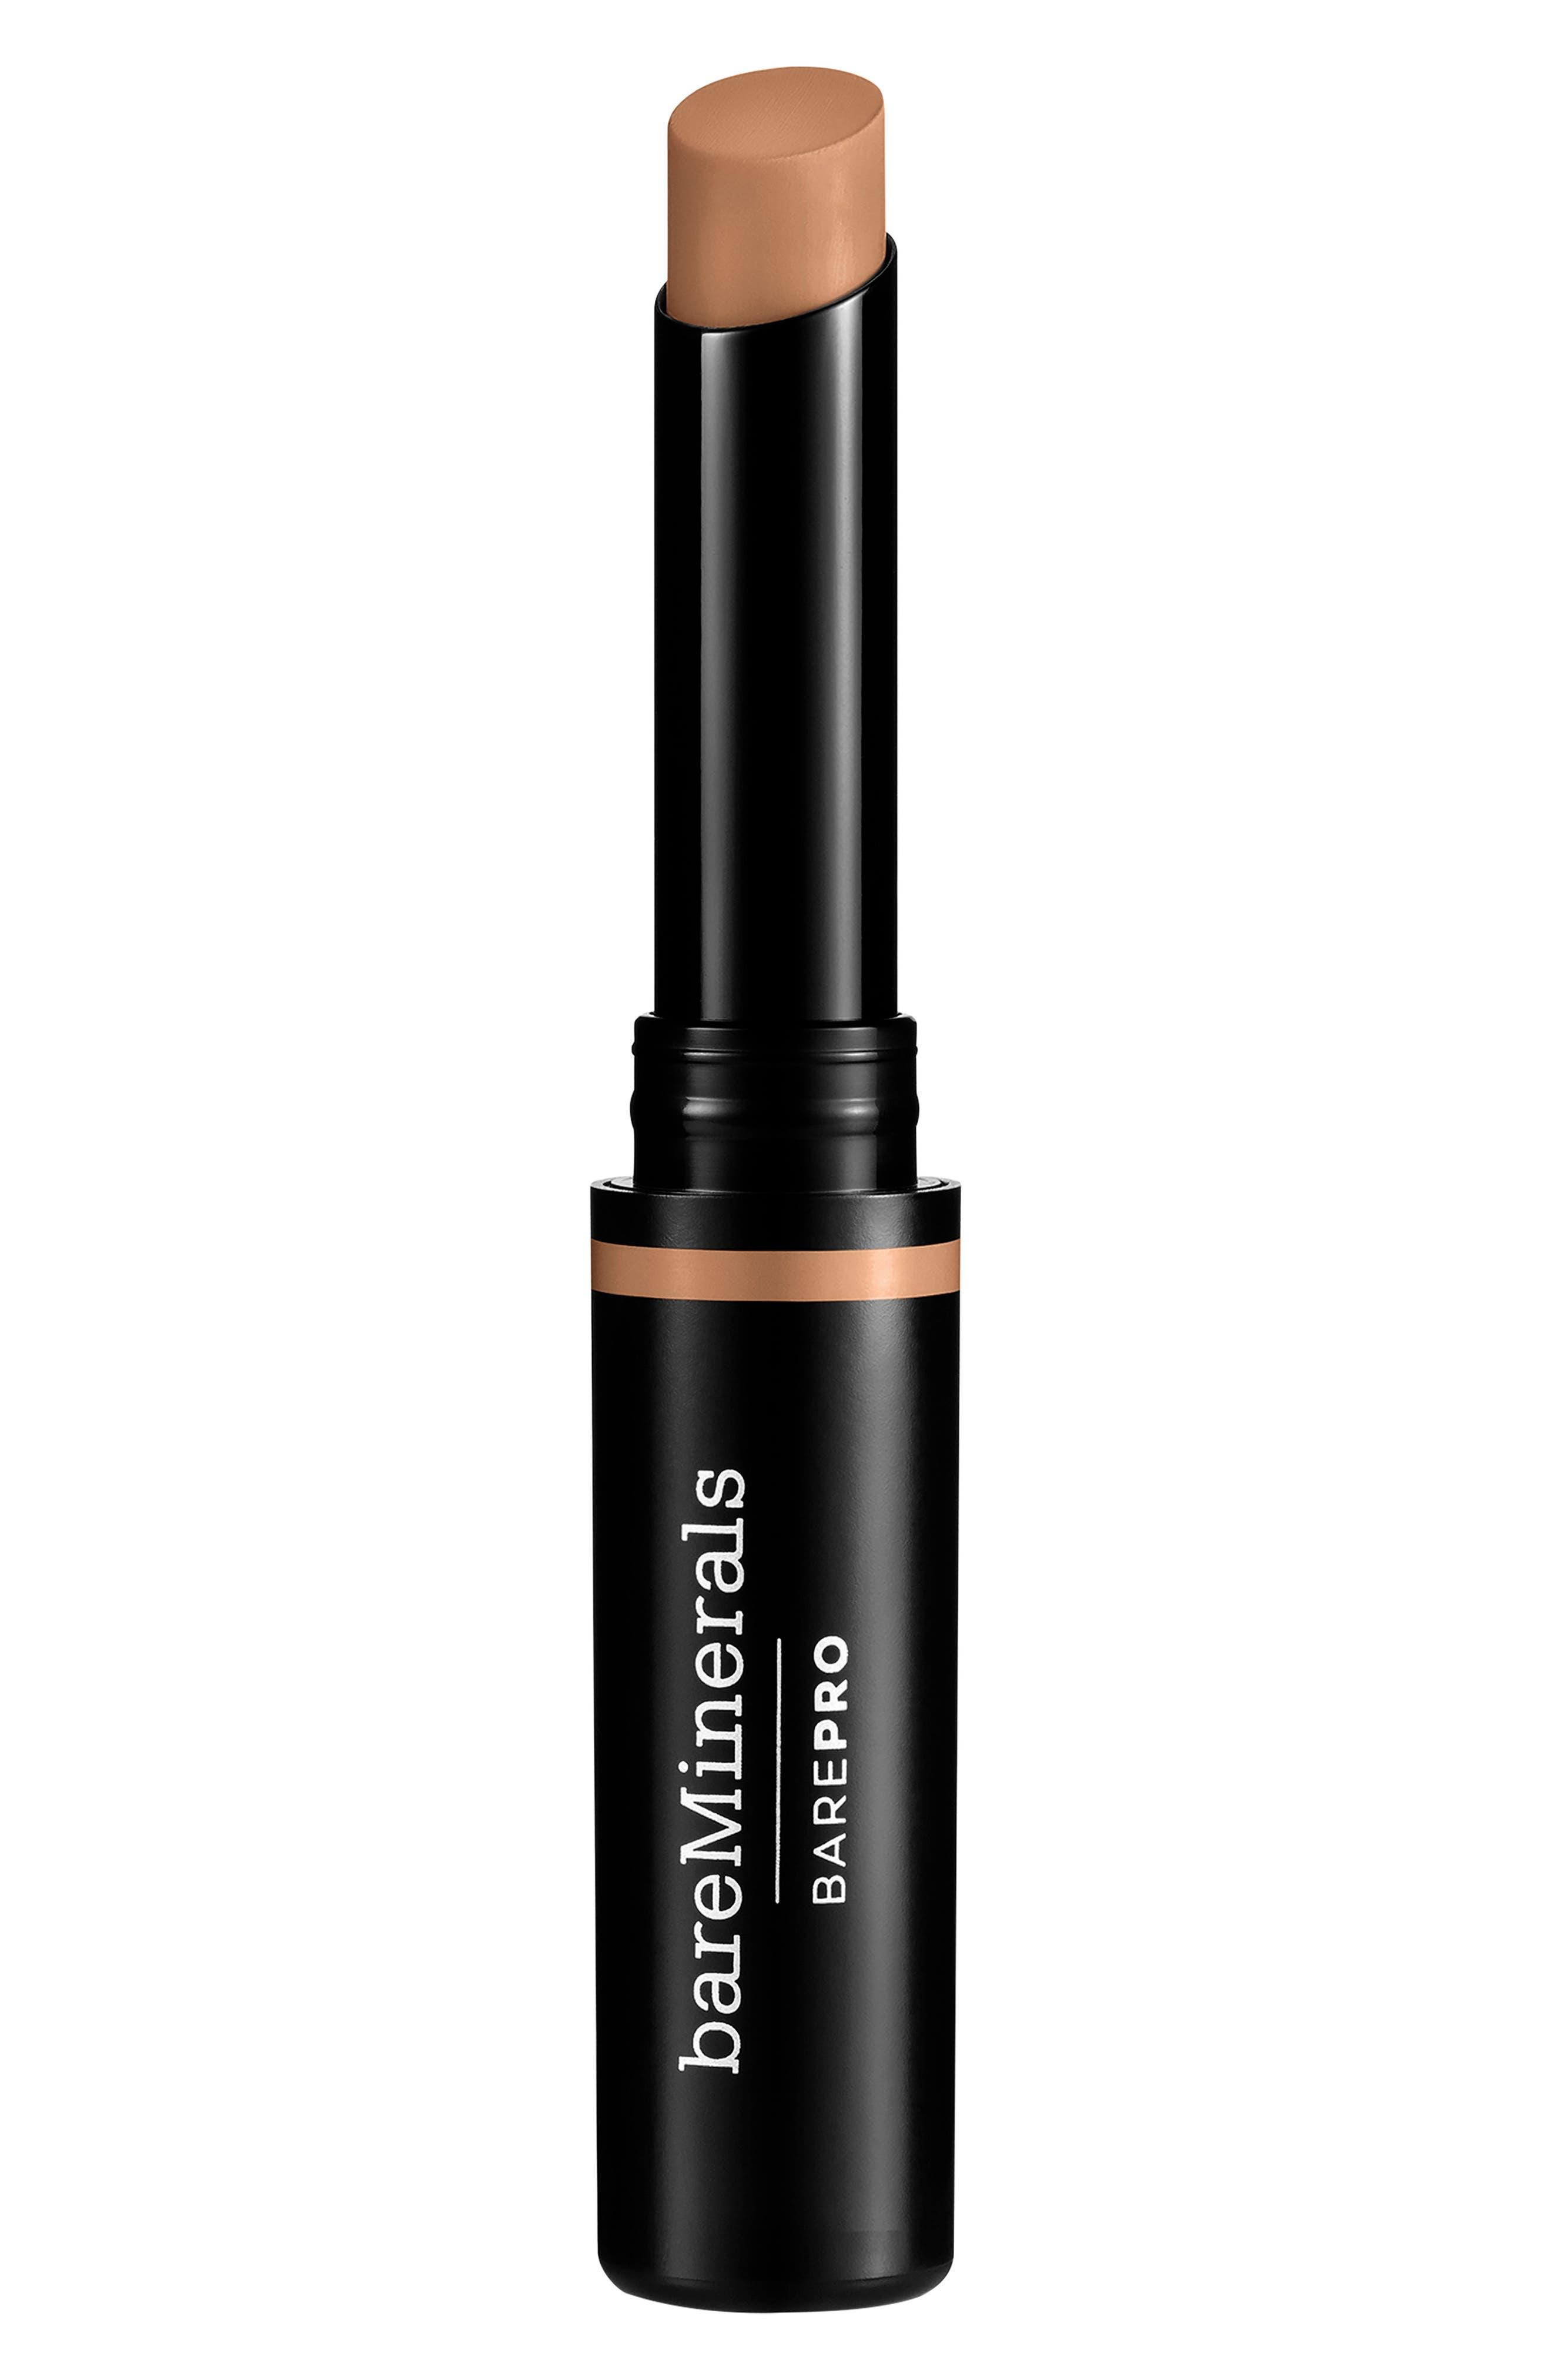 BarePro<sup>®</sup> Stick Concealer,                             Main thumbnail 1, color,                             11 TAN/DARK-WARM